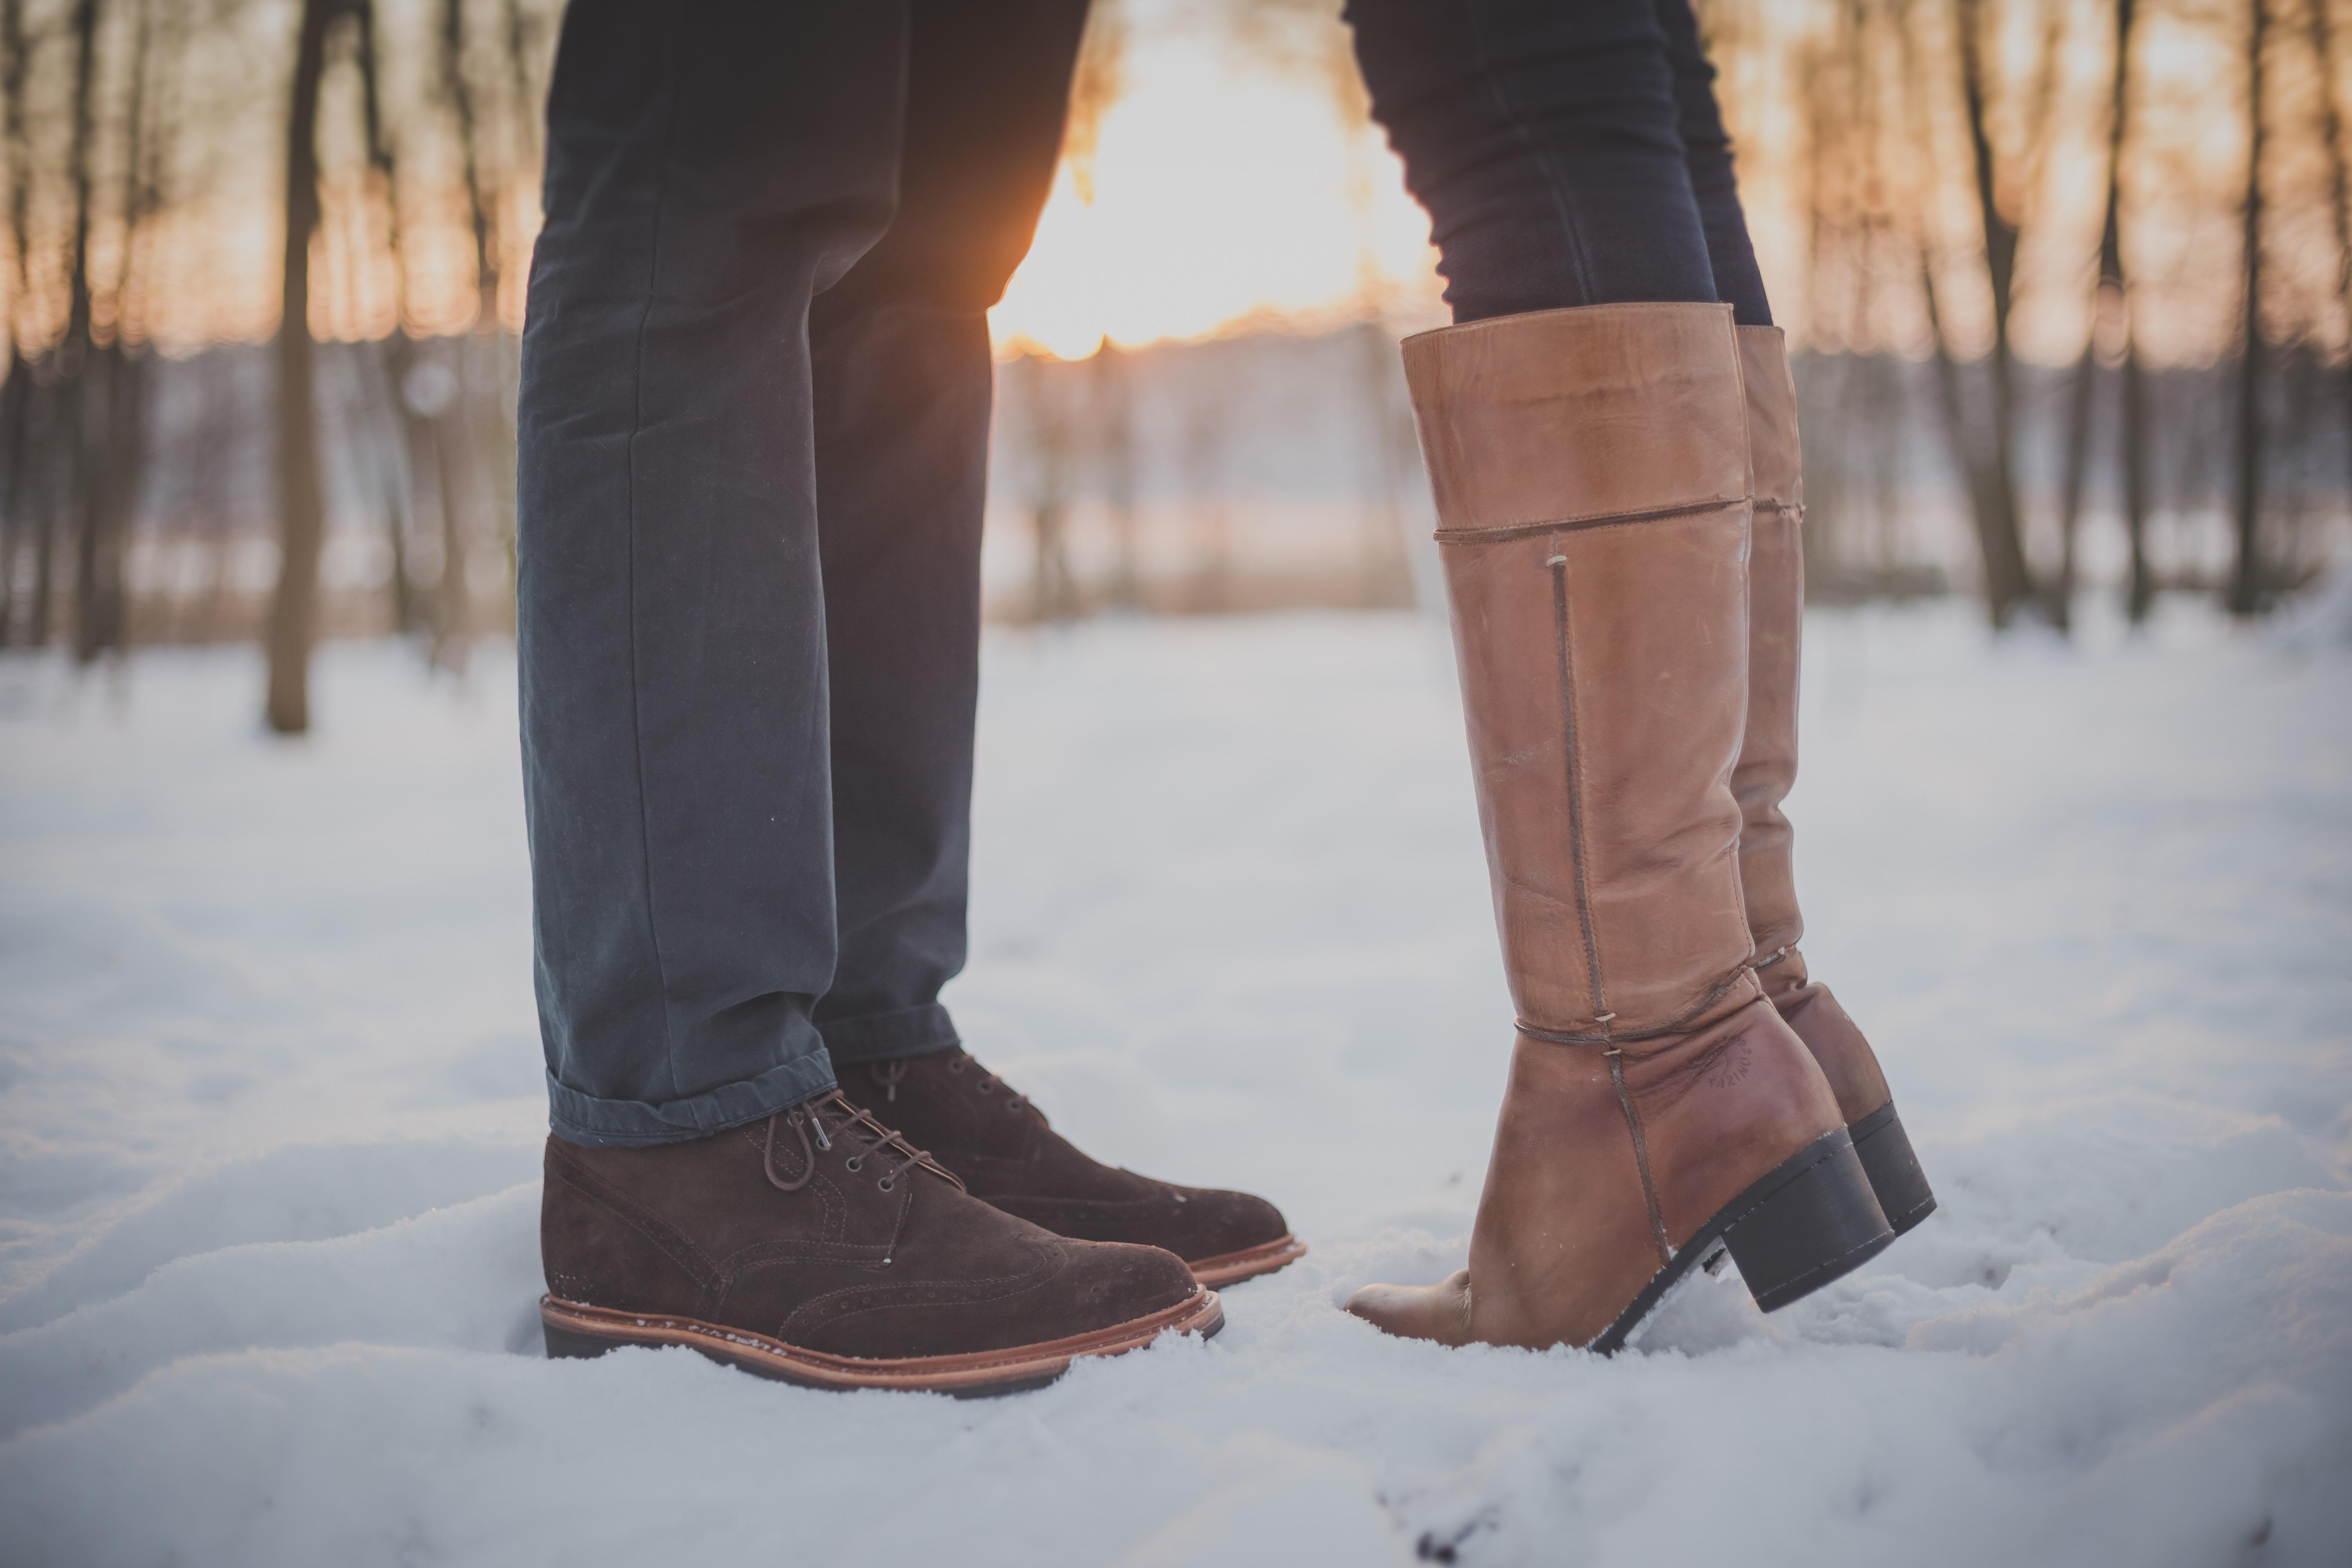 man, shoe, snow, winter, sunset, feet